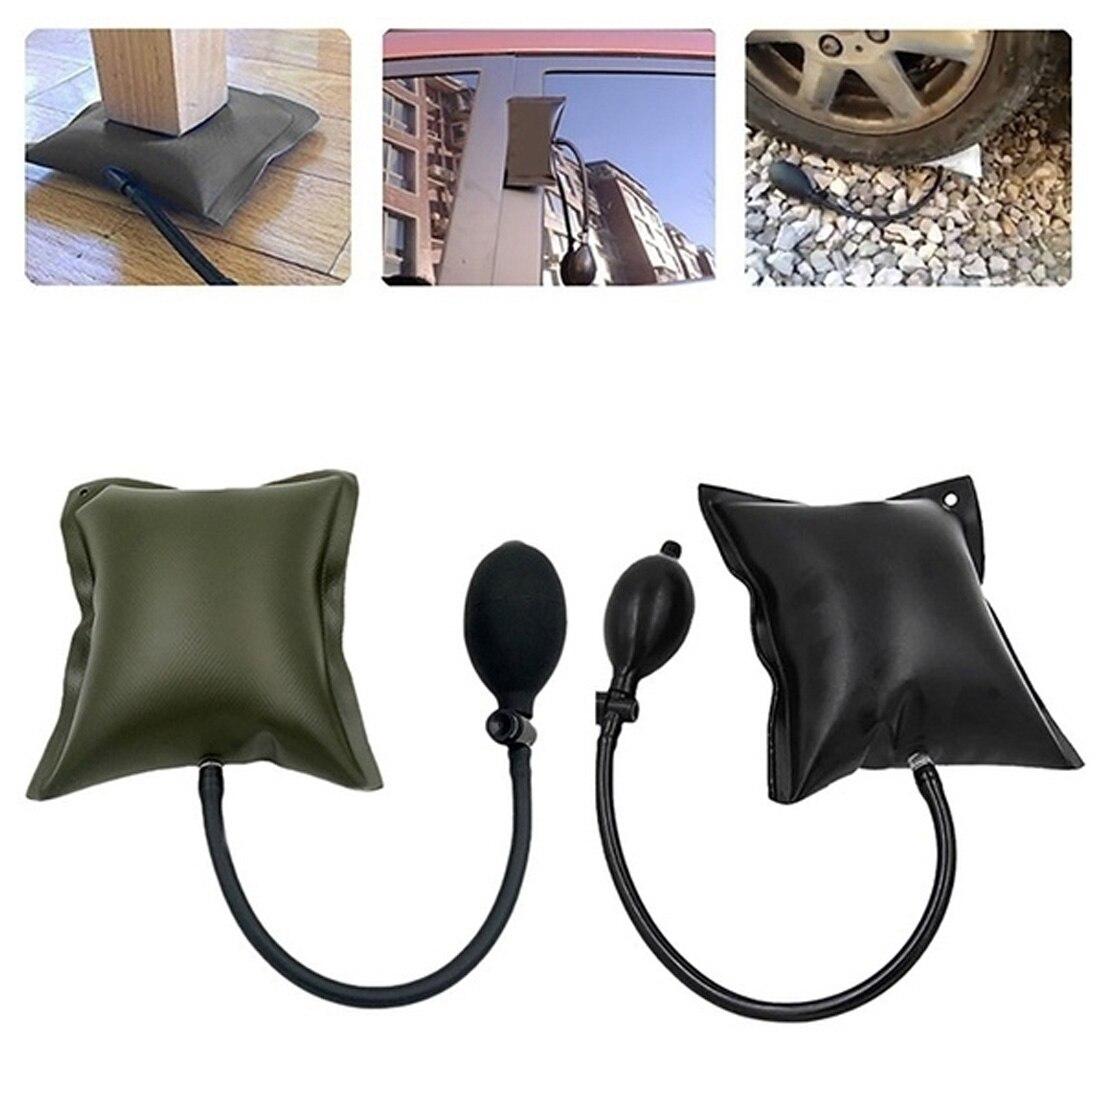 Car Door Repair NEW PDR Tools Pump Wedge Lock Smith Tools Auto Air Wedge Air Bag Lock Pick Set Open Car Door Lock Hand Tools